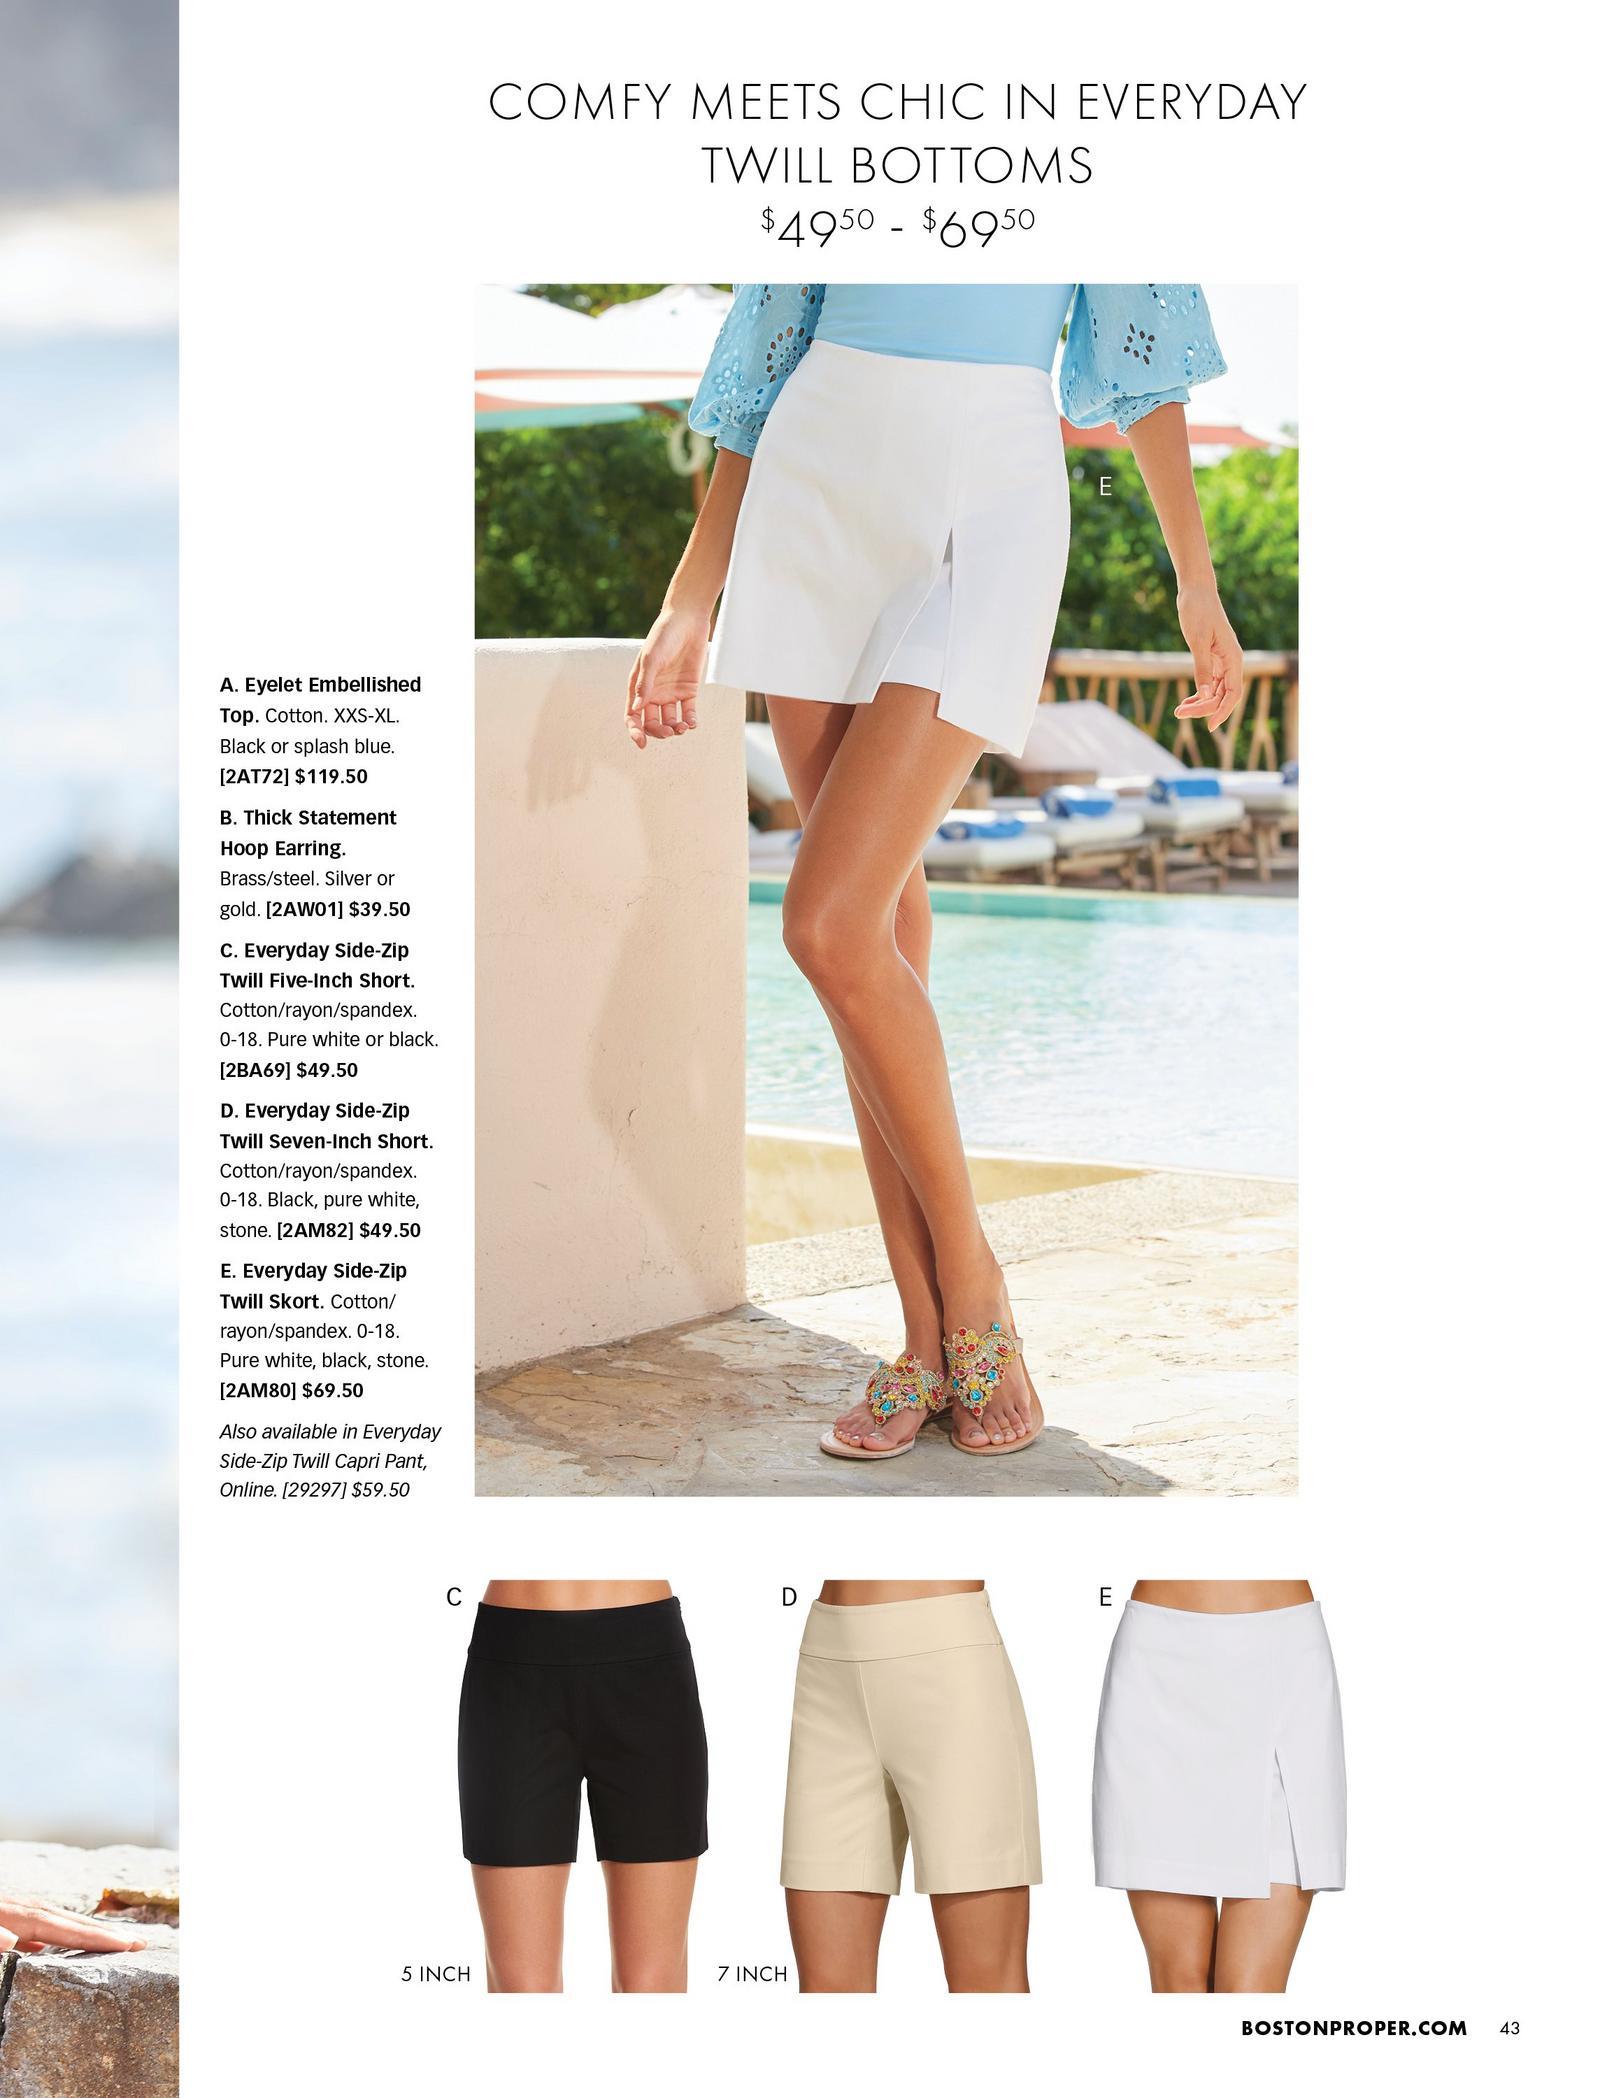 top model wearing a white skort. bottom left to right: black 5-inch shorts, khaki 7-inch shorts, white skort.